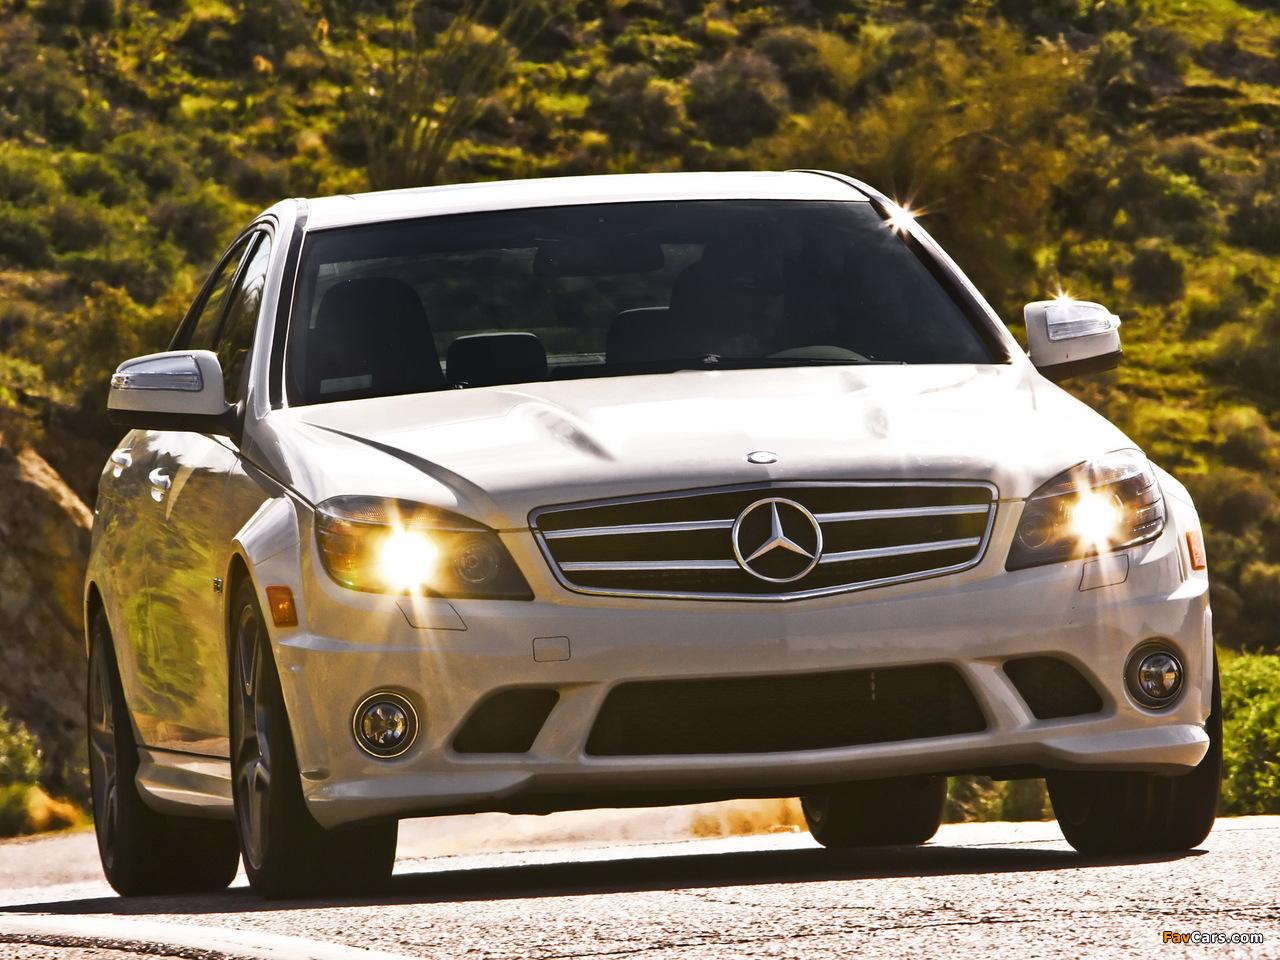 Mercedes-Benz C 63 AMG US-spec (W204) 2007–11 pictures (1280 x 960)